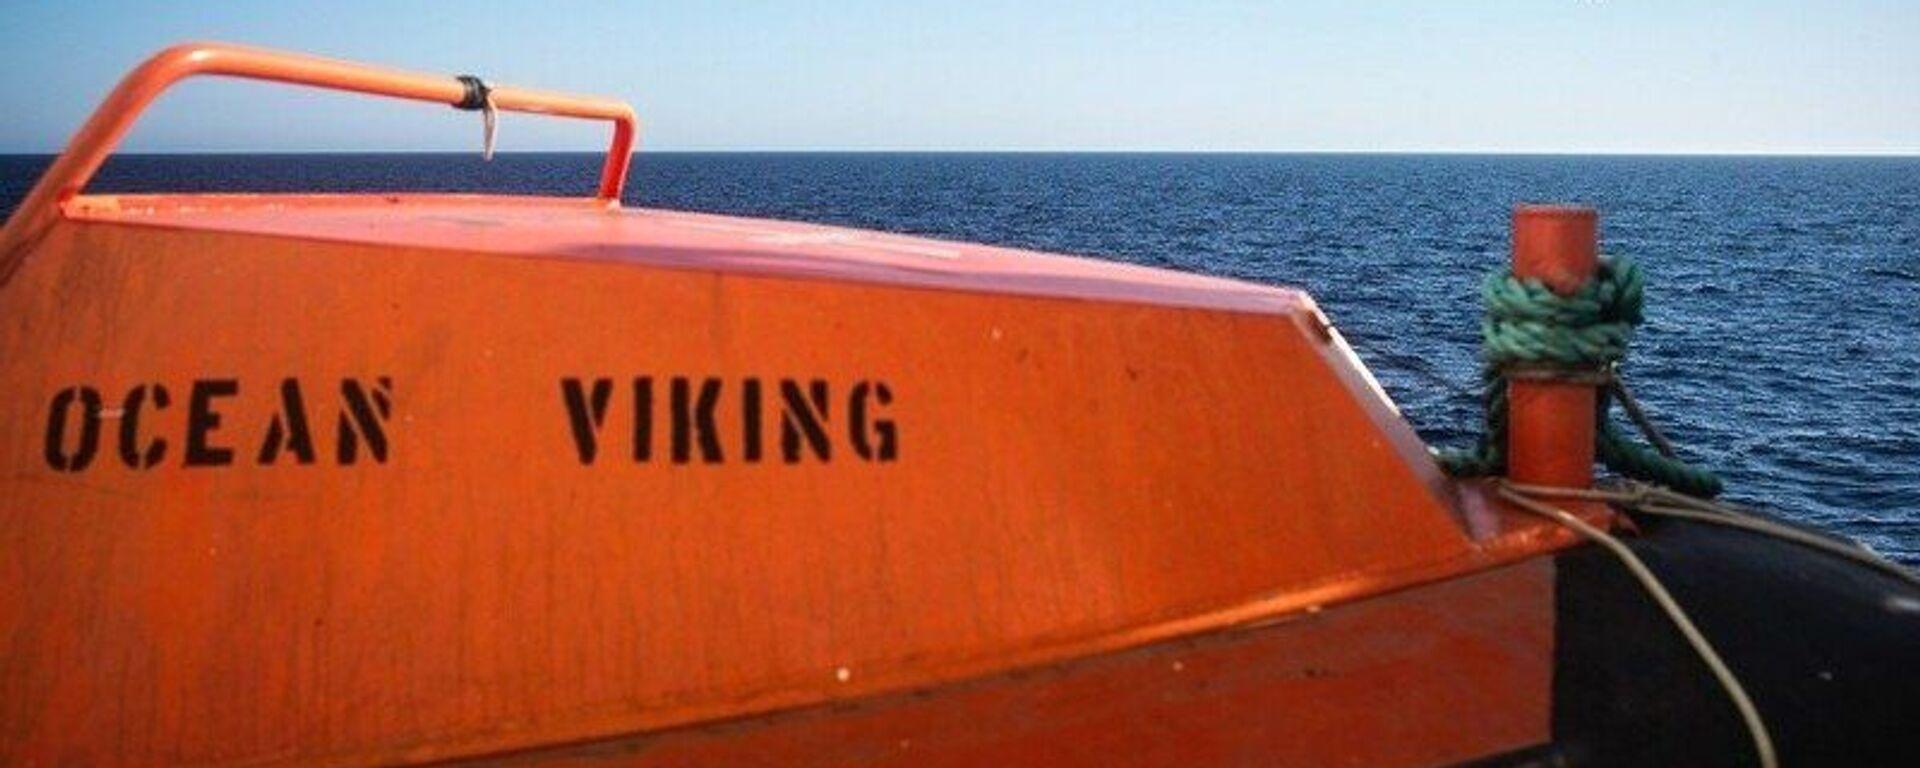 Nave Ocean Viking / Sos Mediterranée - Sputnik Italia, 1920, 09.07.2021